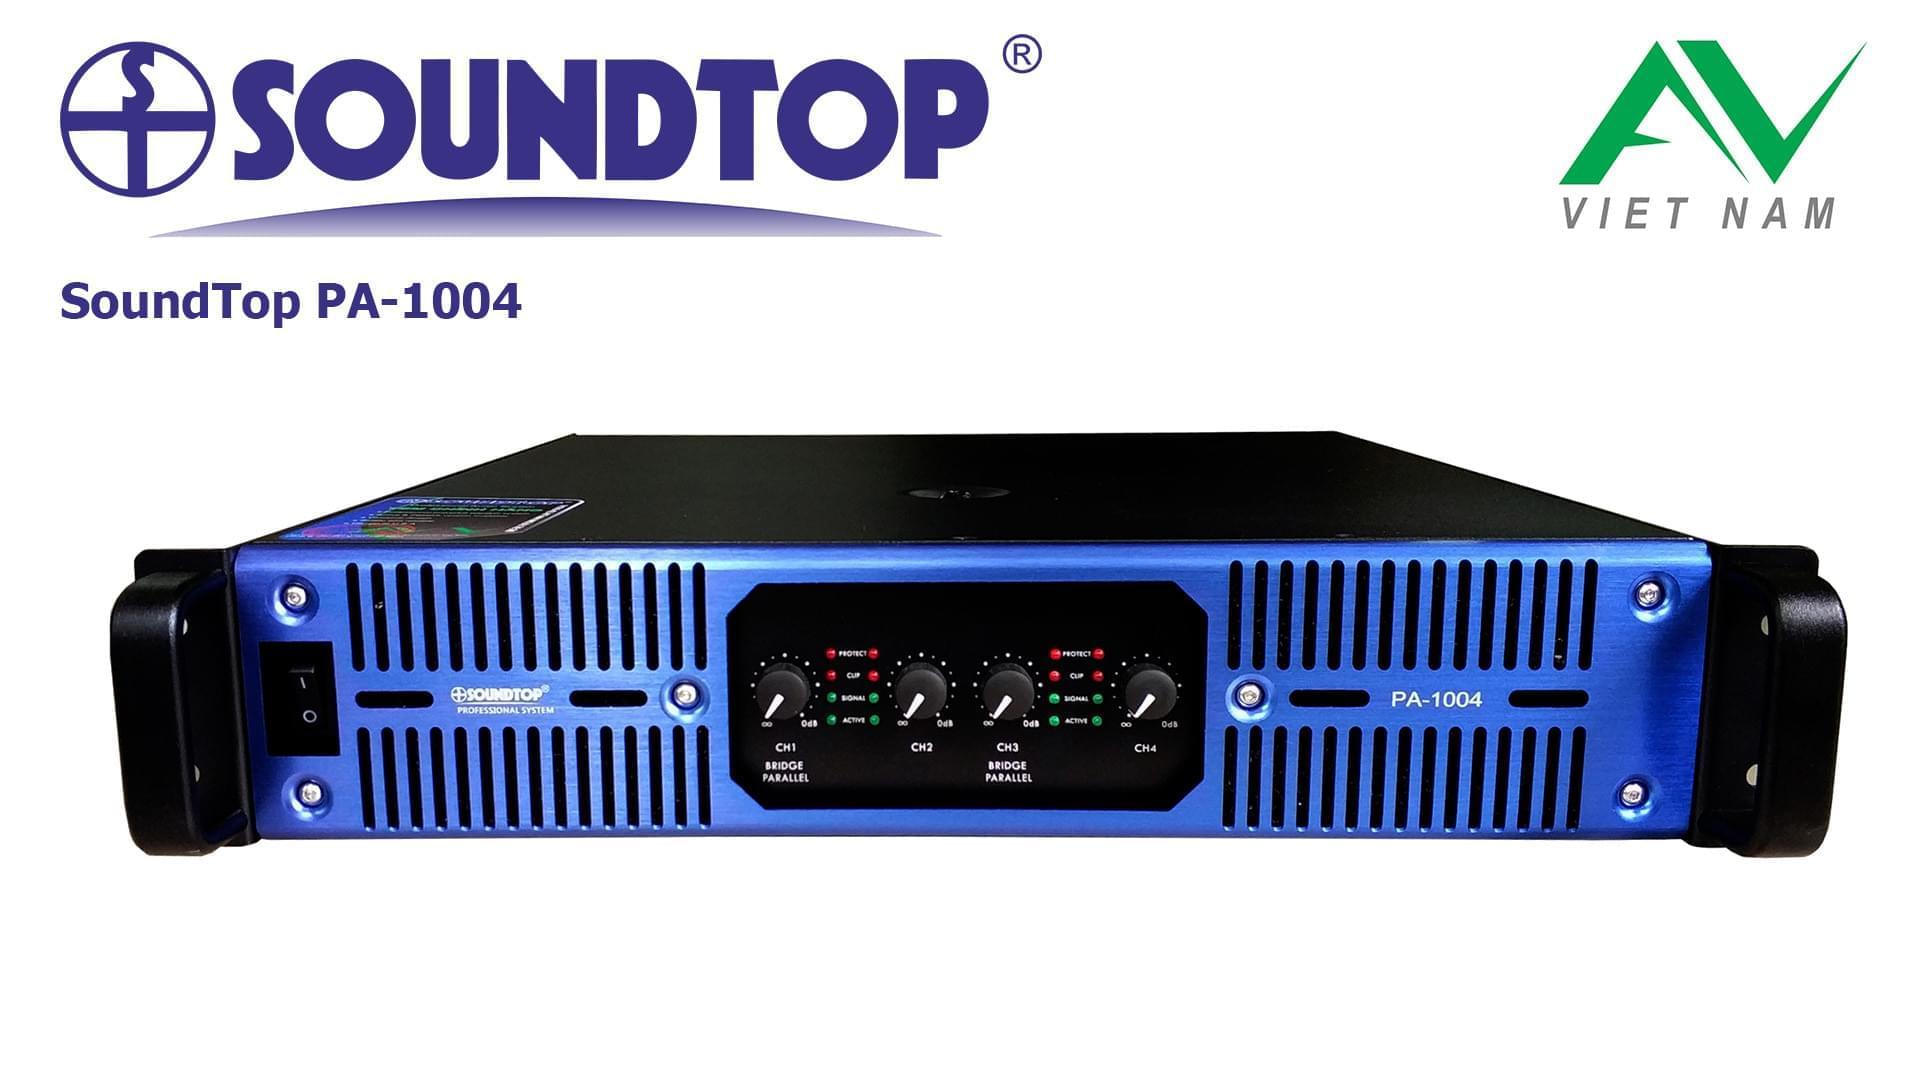 soundtop-pa-1004-ok-ok.jpg